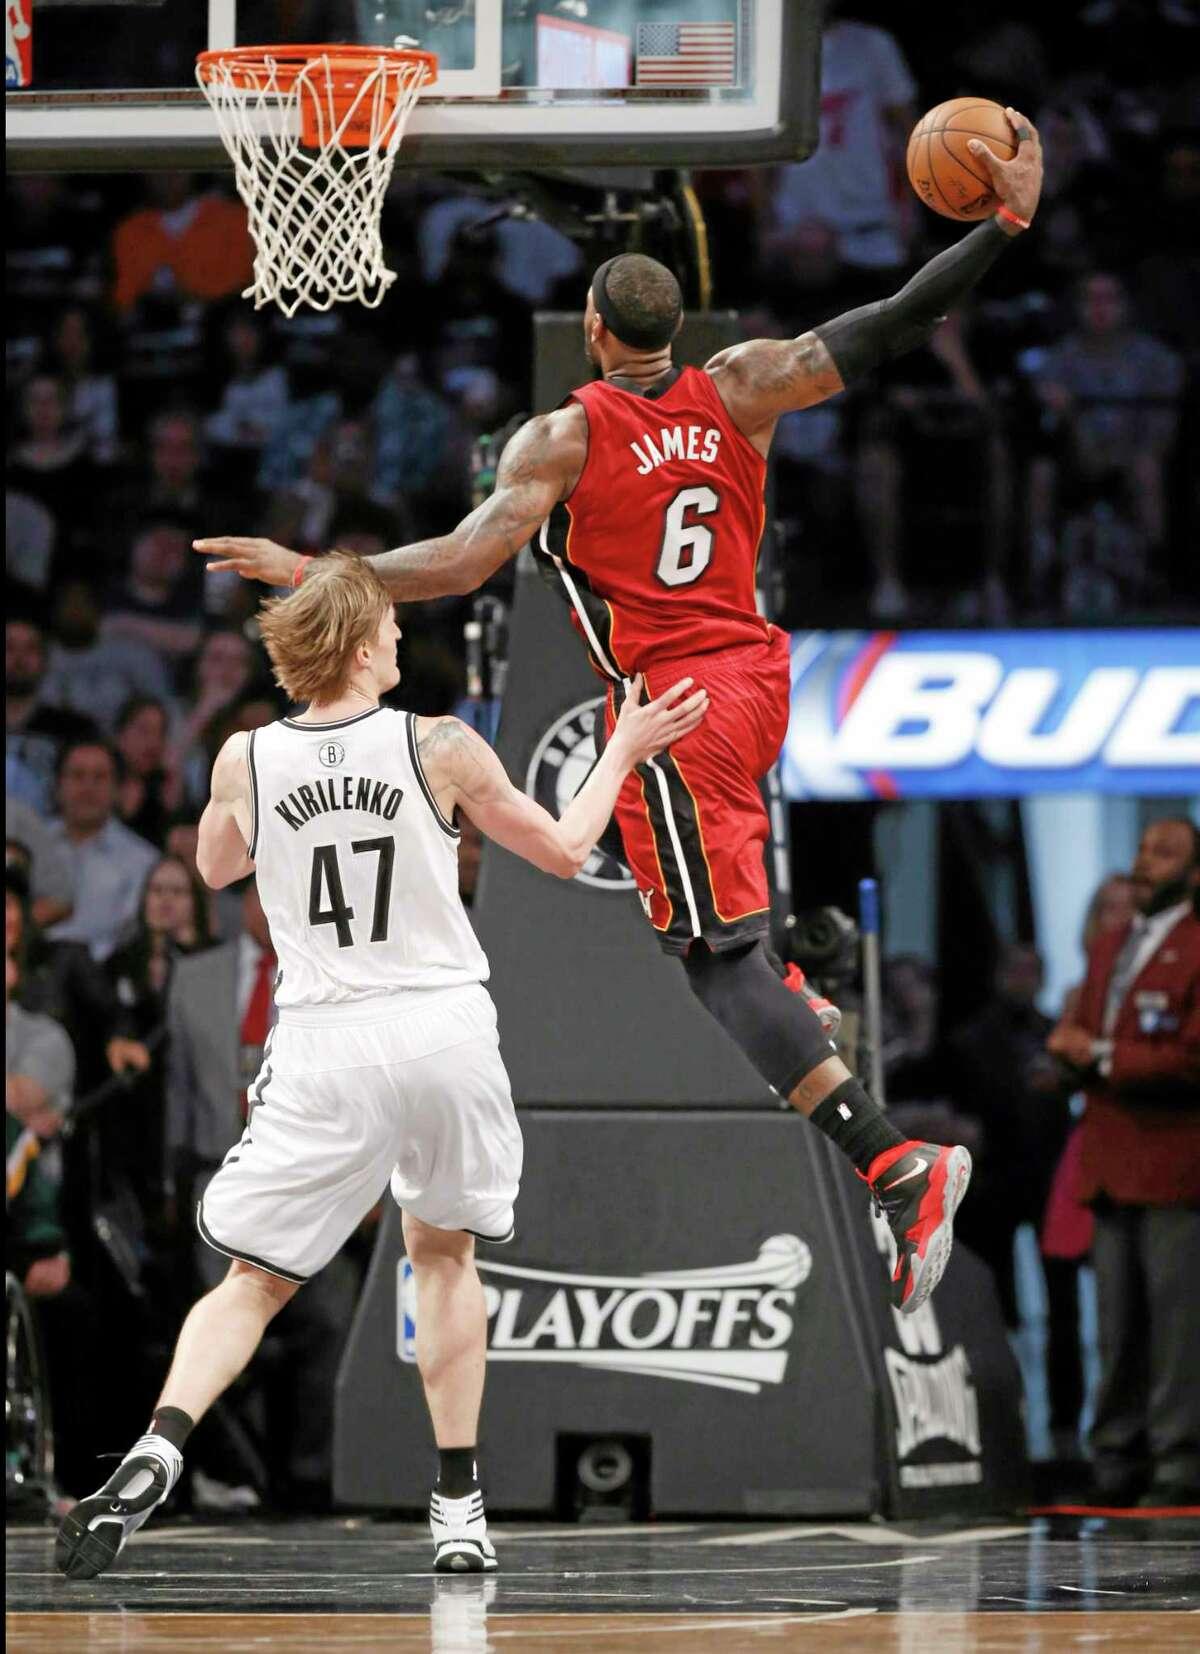 Miami Heat forward LeBron James (6) scores over Brooklyn Nets forward Andrei Kirilenko (47) in the first half of Game 4 Monday.